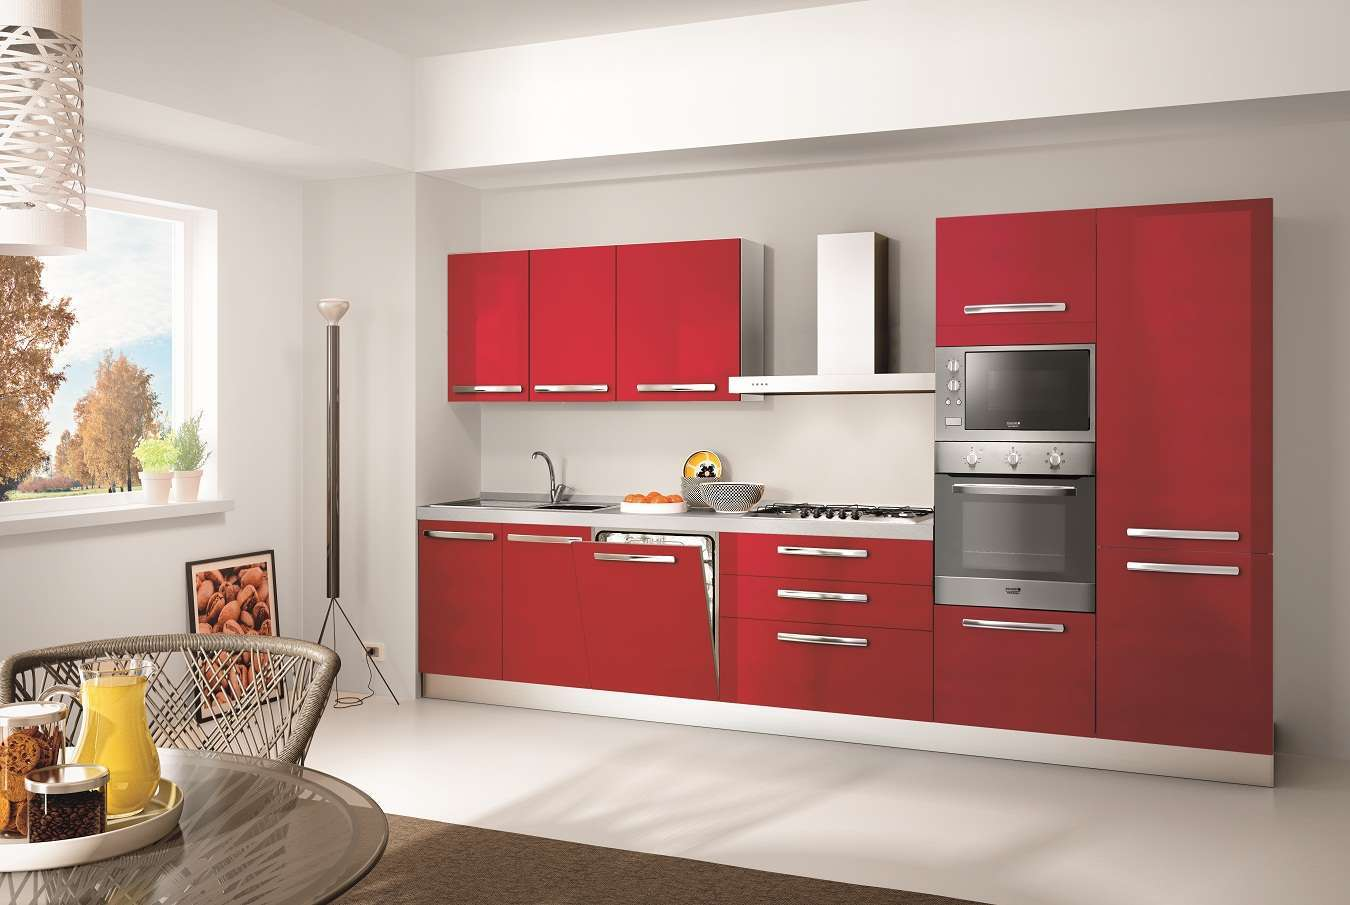 Mobili da cucina da incasso design casa creativa e - Misure mobili da cucina ...